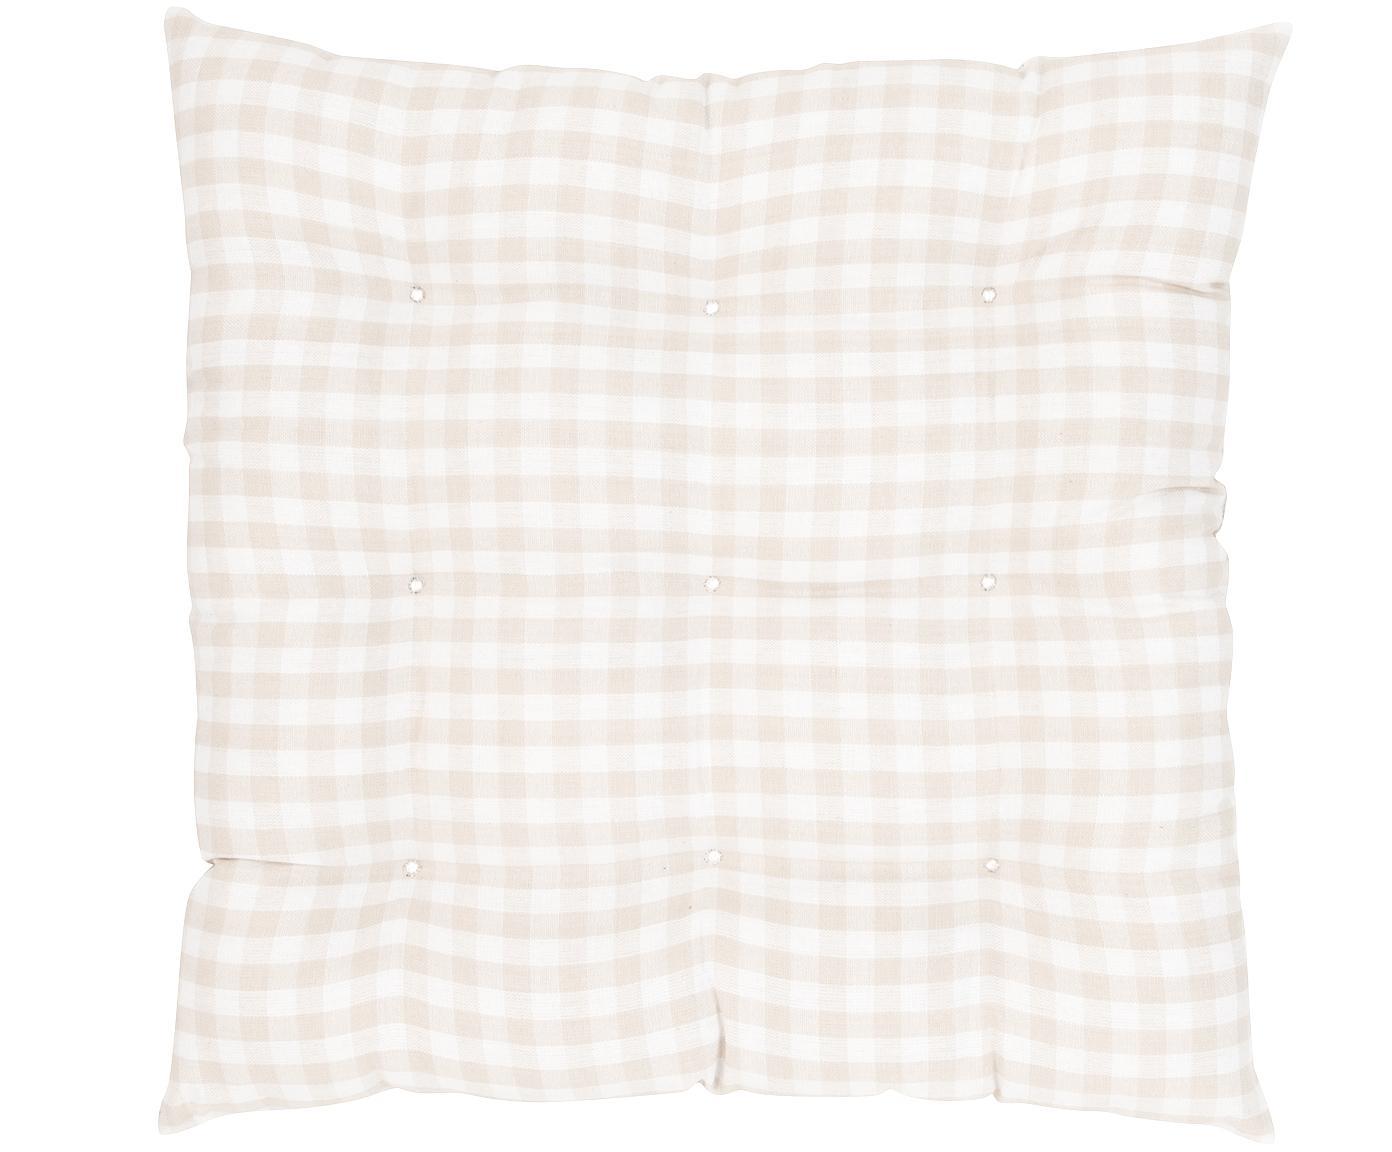 Cuscino sedia a quadretti Karolin, Beige, bianco crema, Larg. 40 x Lung. 40 cm